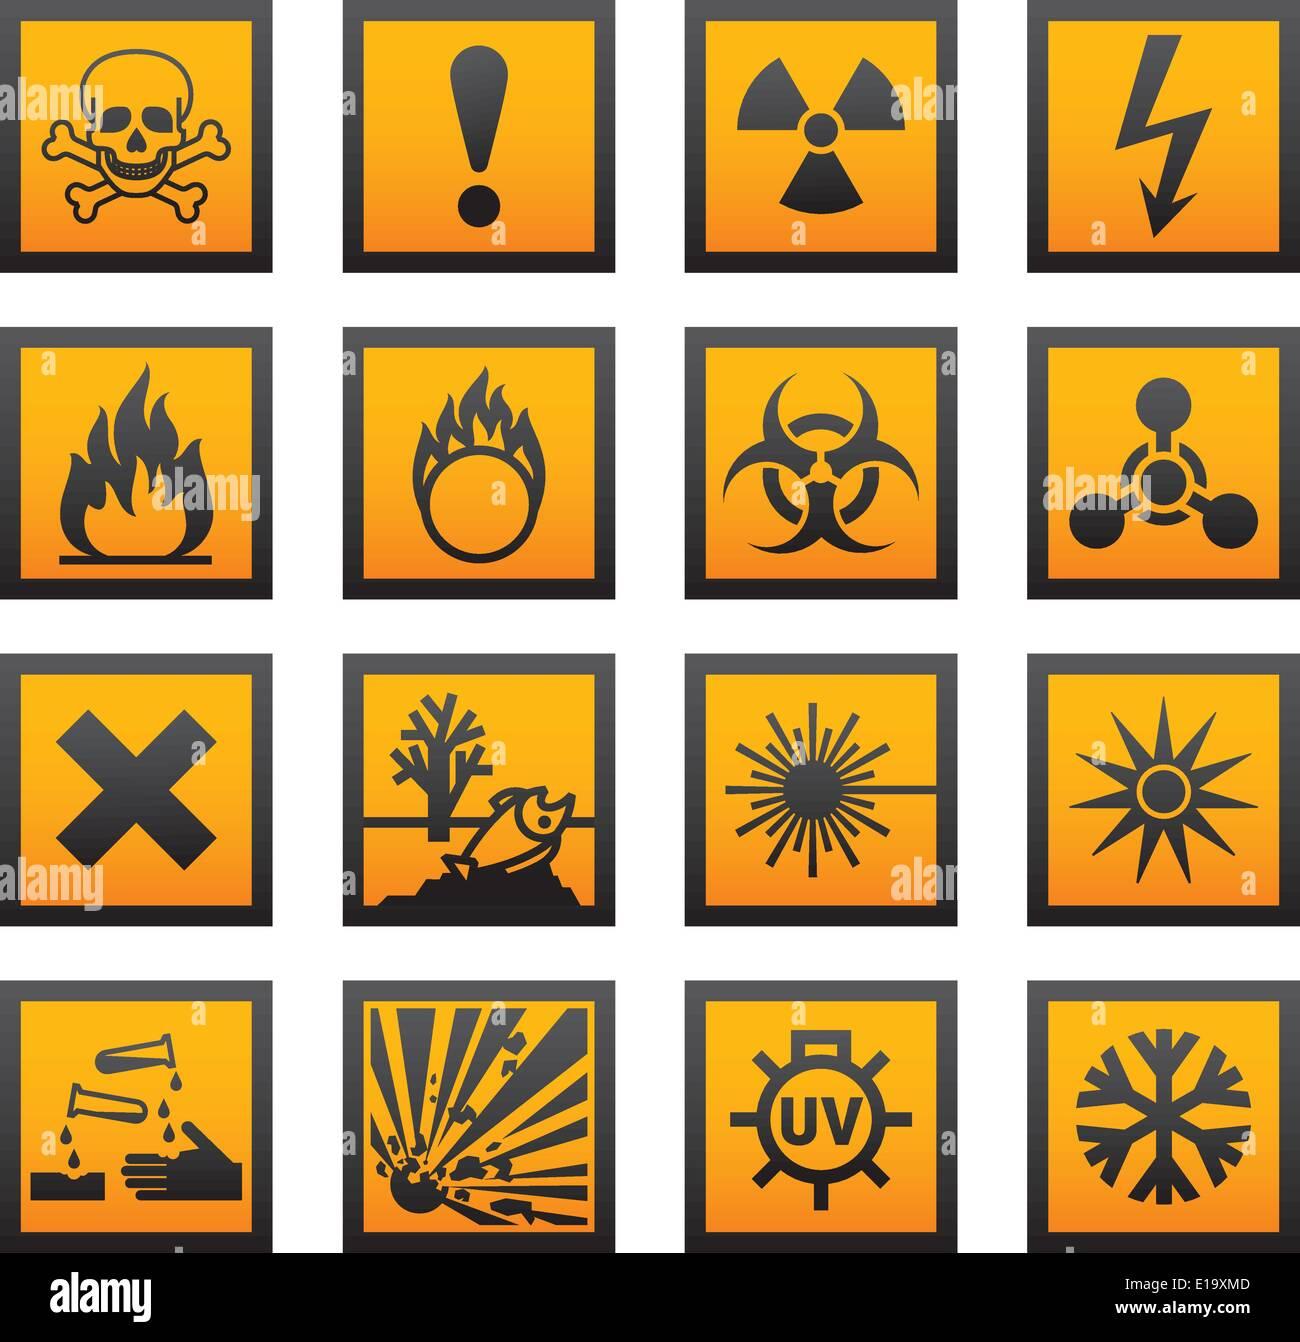 European Hazard Symbols Stock Vector Art Amp Illustration